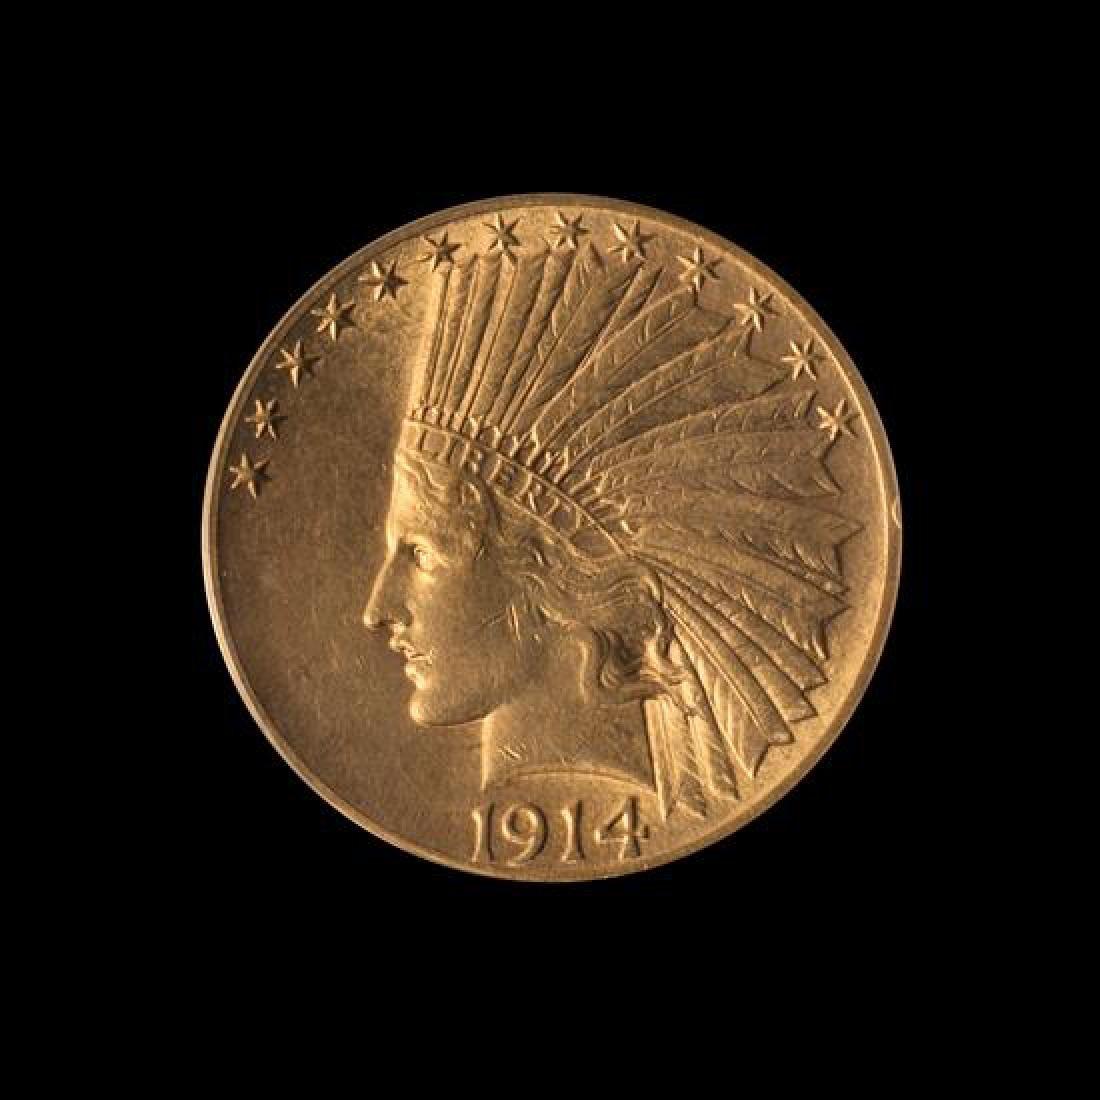 1914-D Indian Head $10 Gold Coin